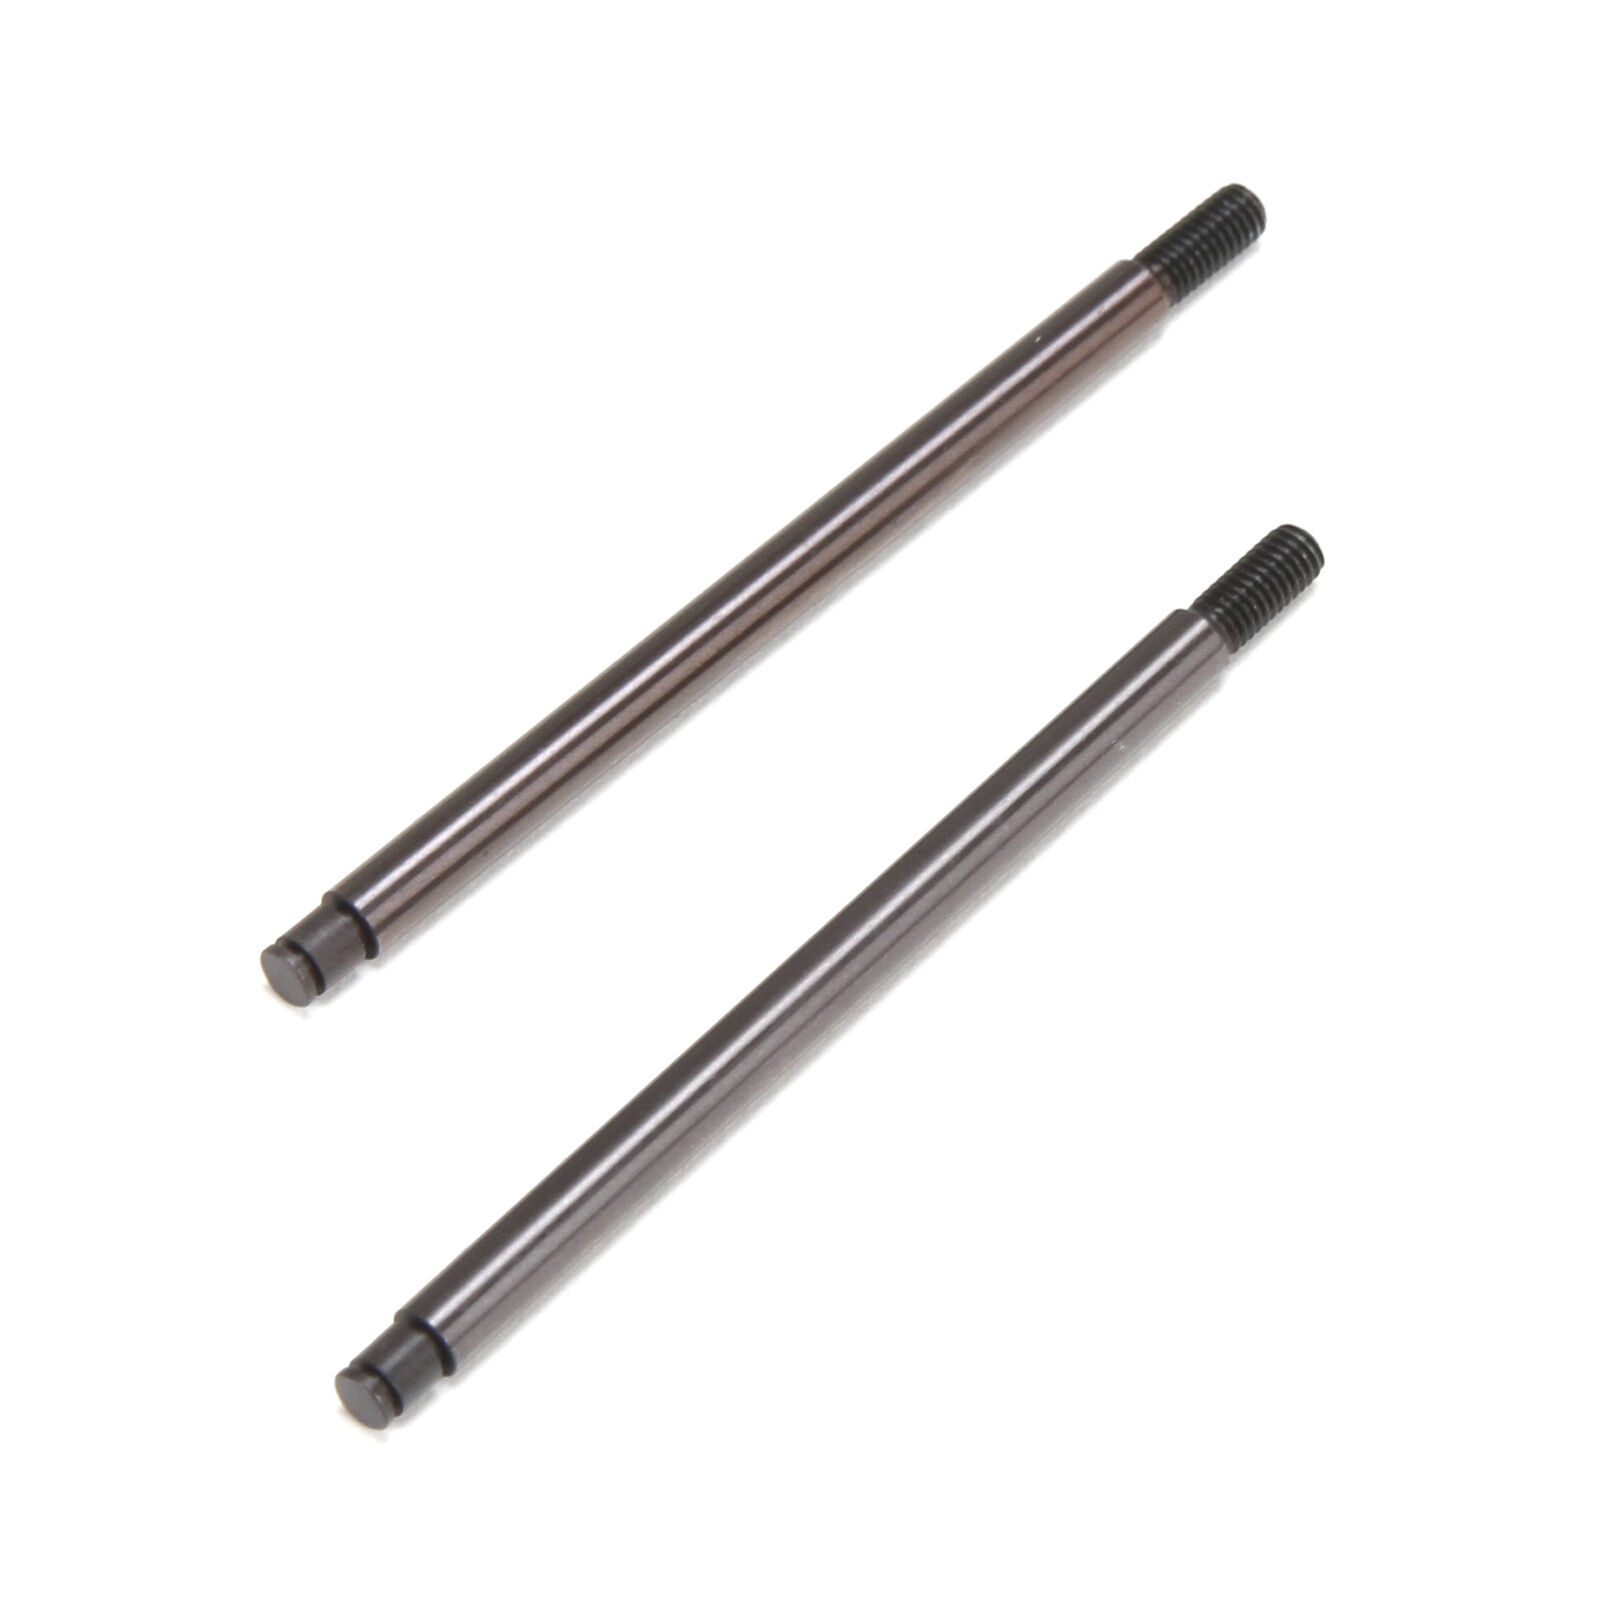 Tiges d'amortisseurs TiCN 3,5x60,5mm (2)